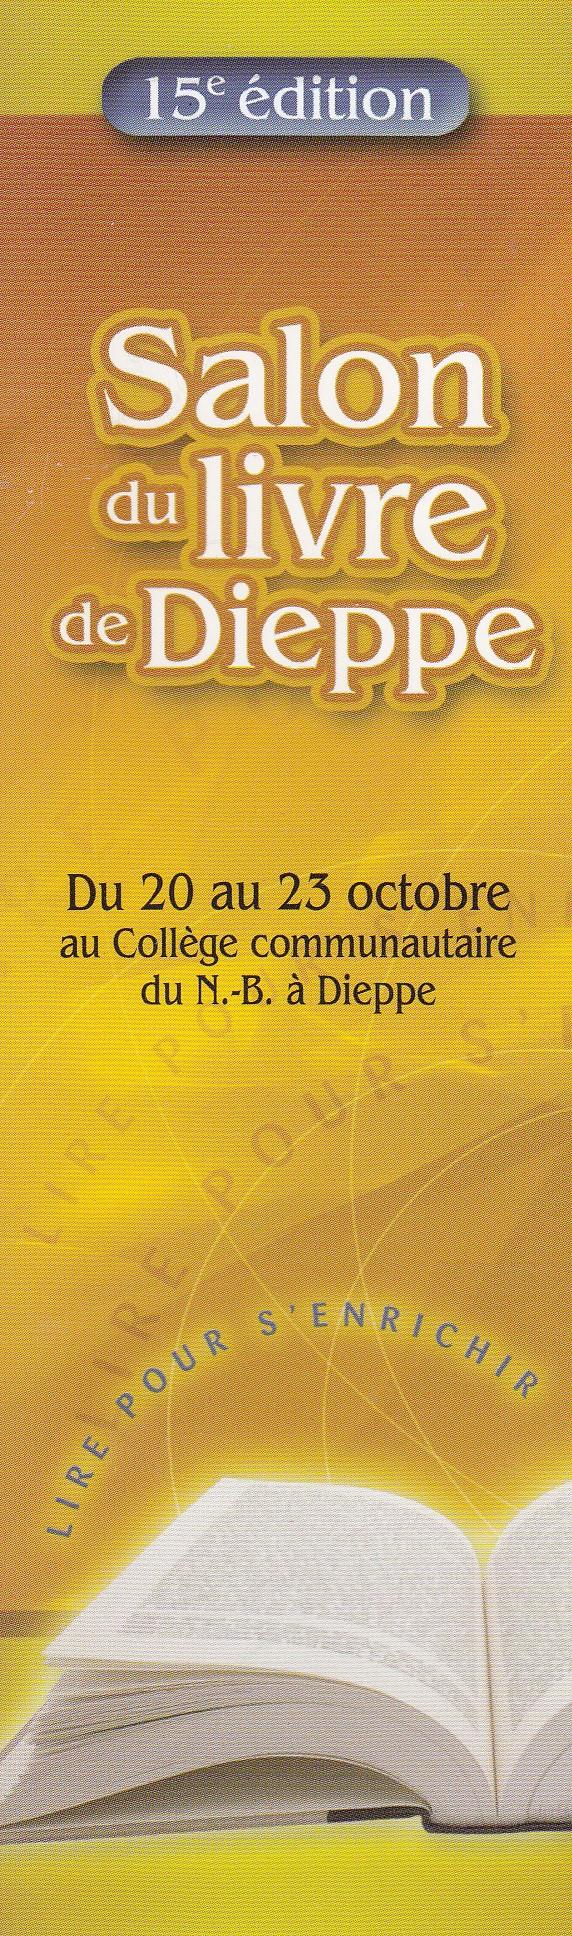 Signet 2005